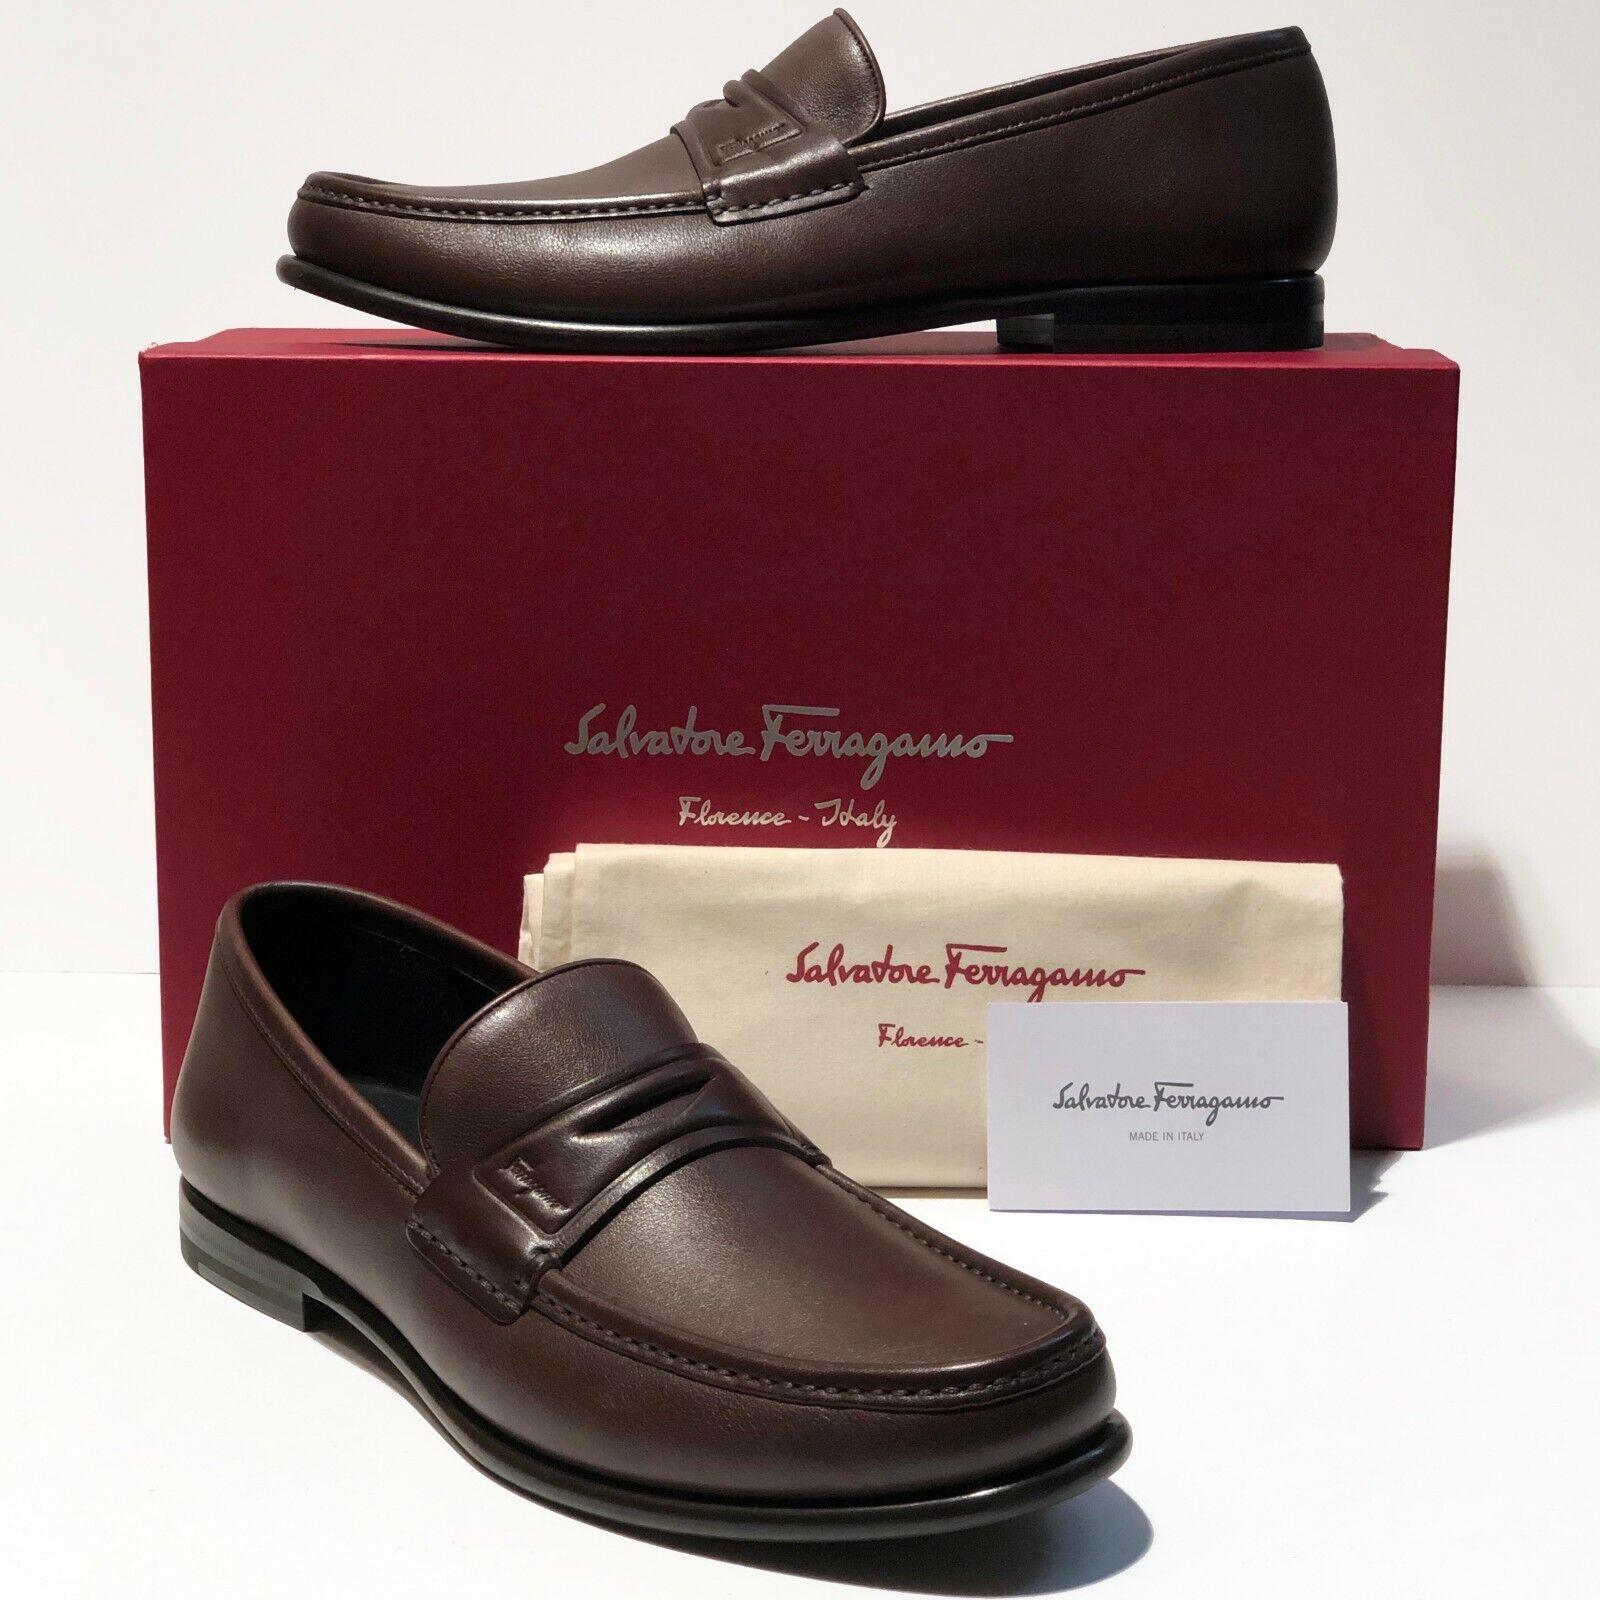 NIB Ferragamo Penny Loafers 8 D 41 Men's Brown Leather Dress